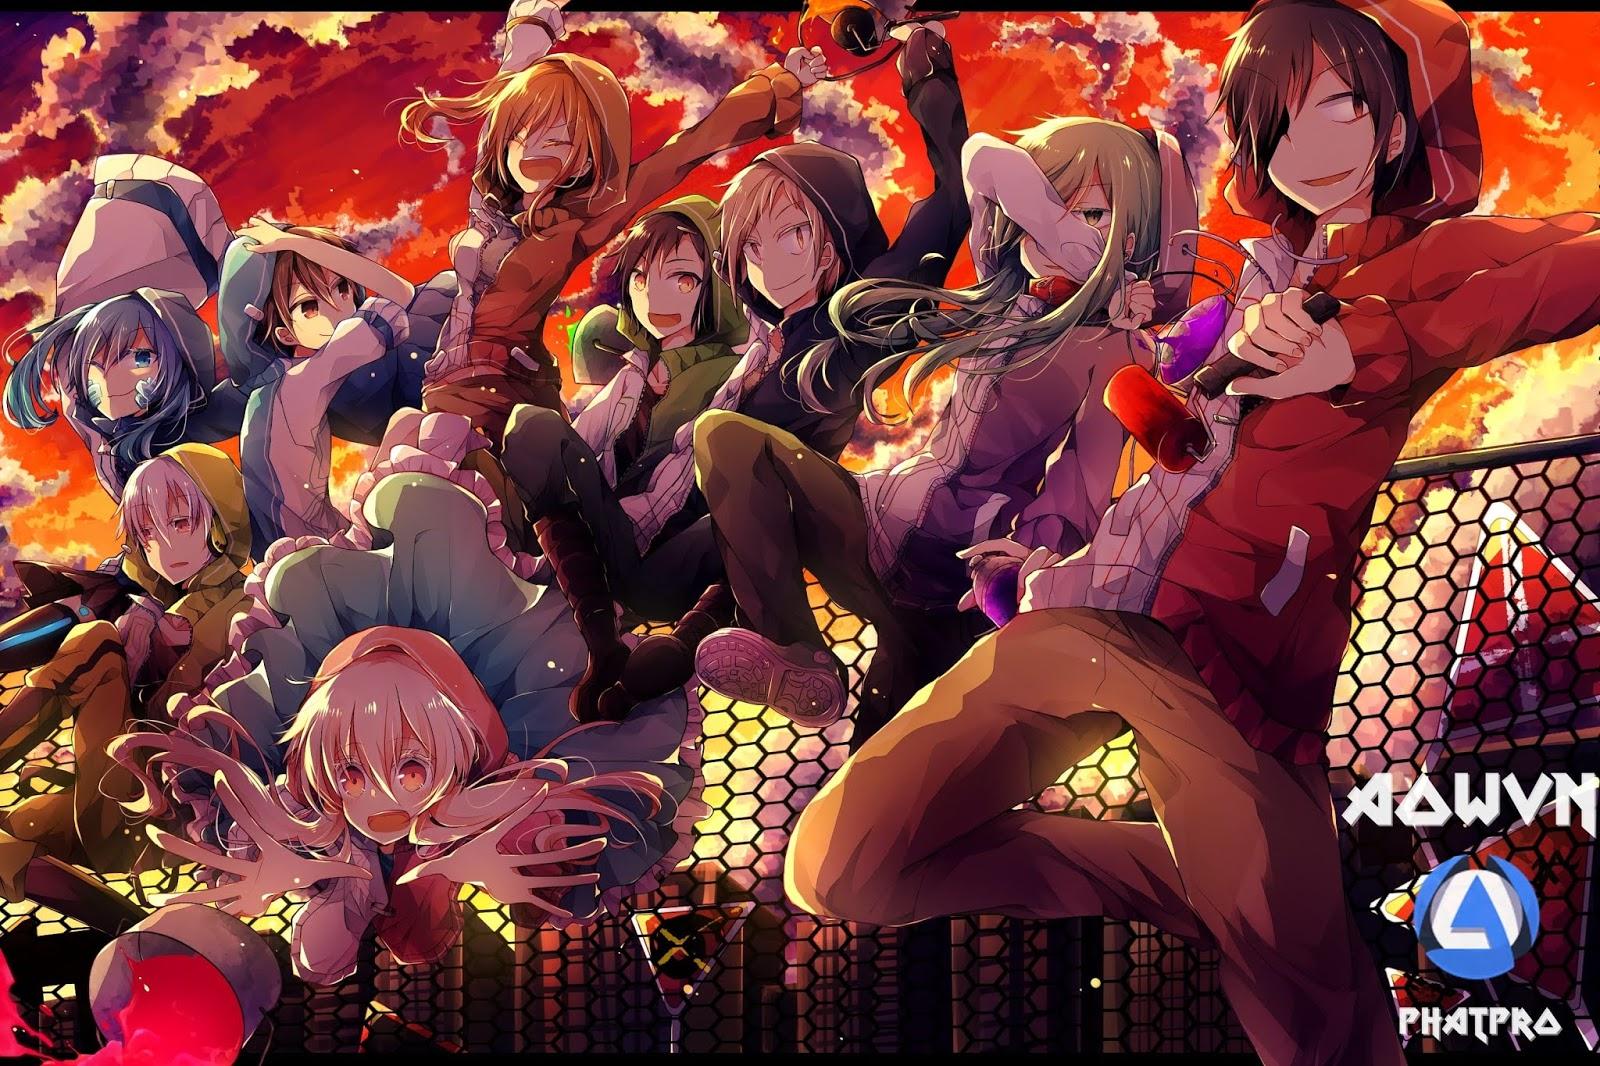 Mekakucity%2B%25284%2529 min - [ Anime 3gp Mp4 ] Mekakucity Actors | Vietsub - Viễn Tưởng Cực Hay